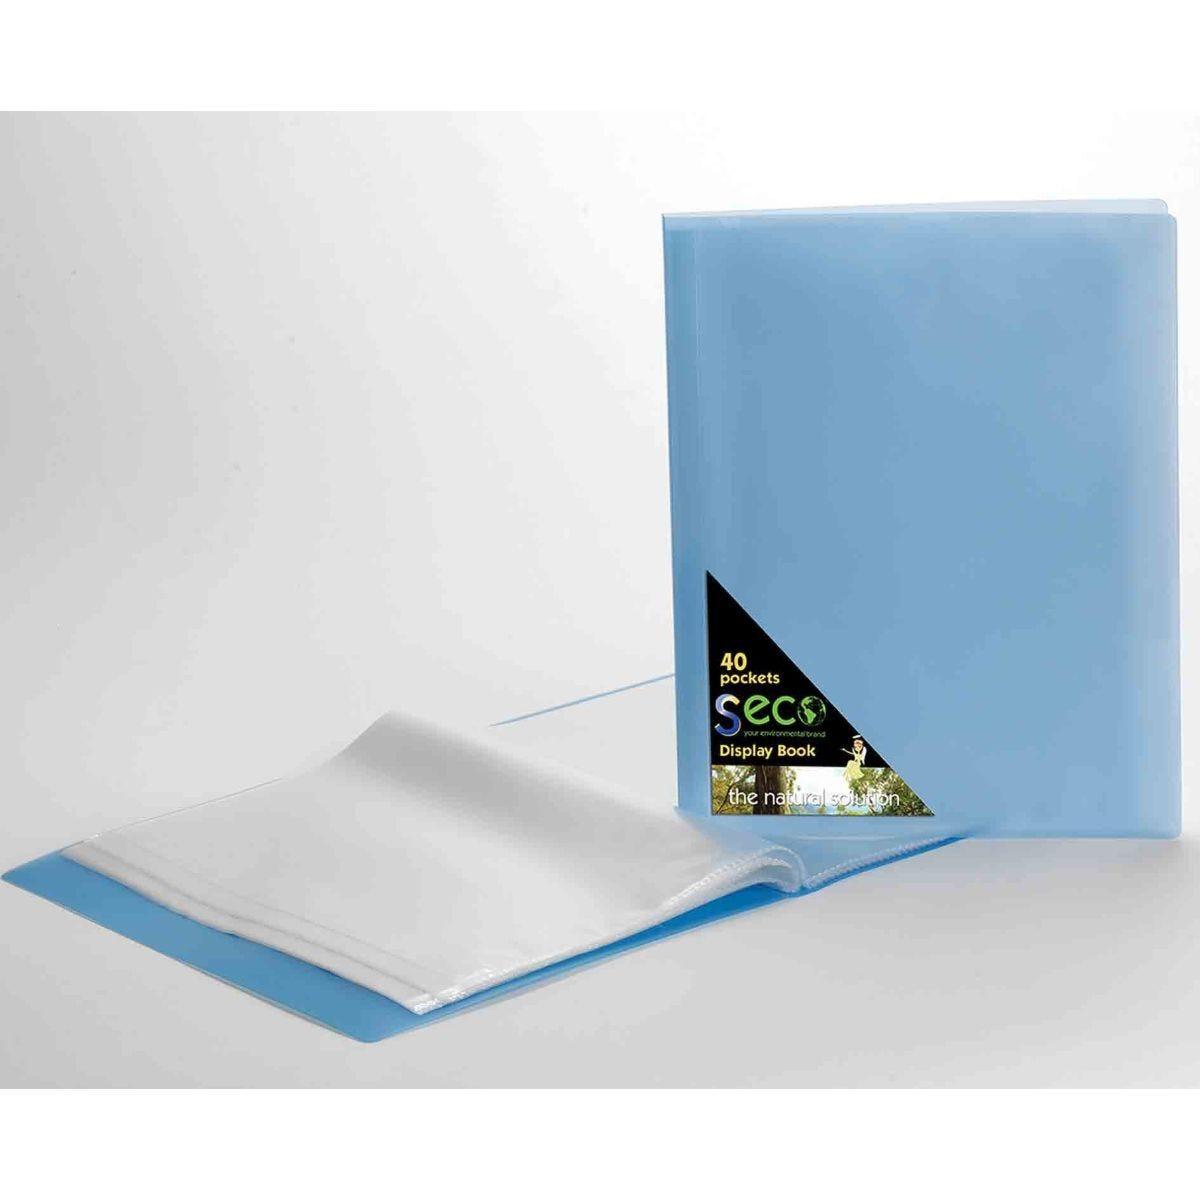 Seco Biodegradable Display Book A4 40 Pockets Blue